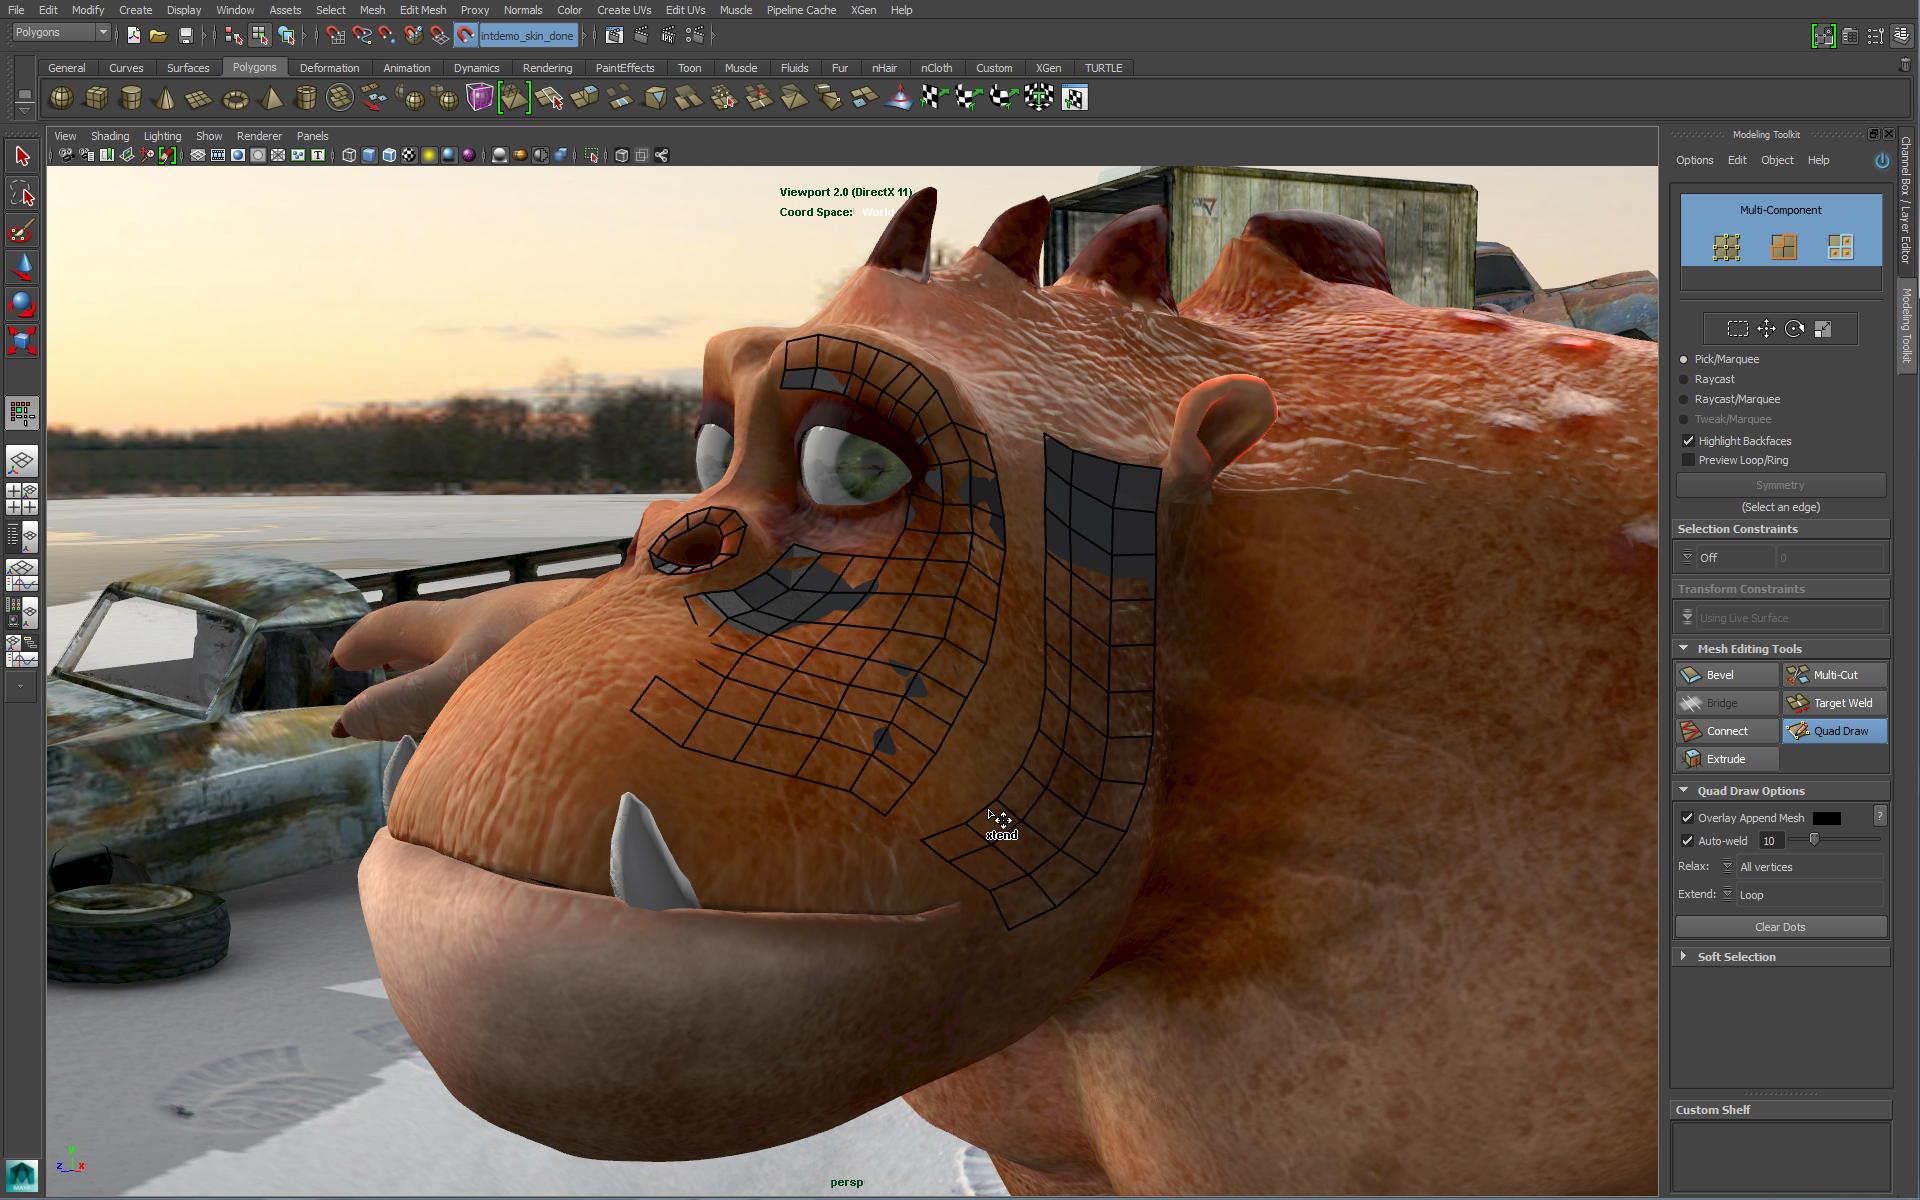 Extension para Autodesk Maya 2014-maya_2014_ext_1_quad_draw_and_extend_edge.png